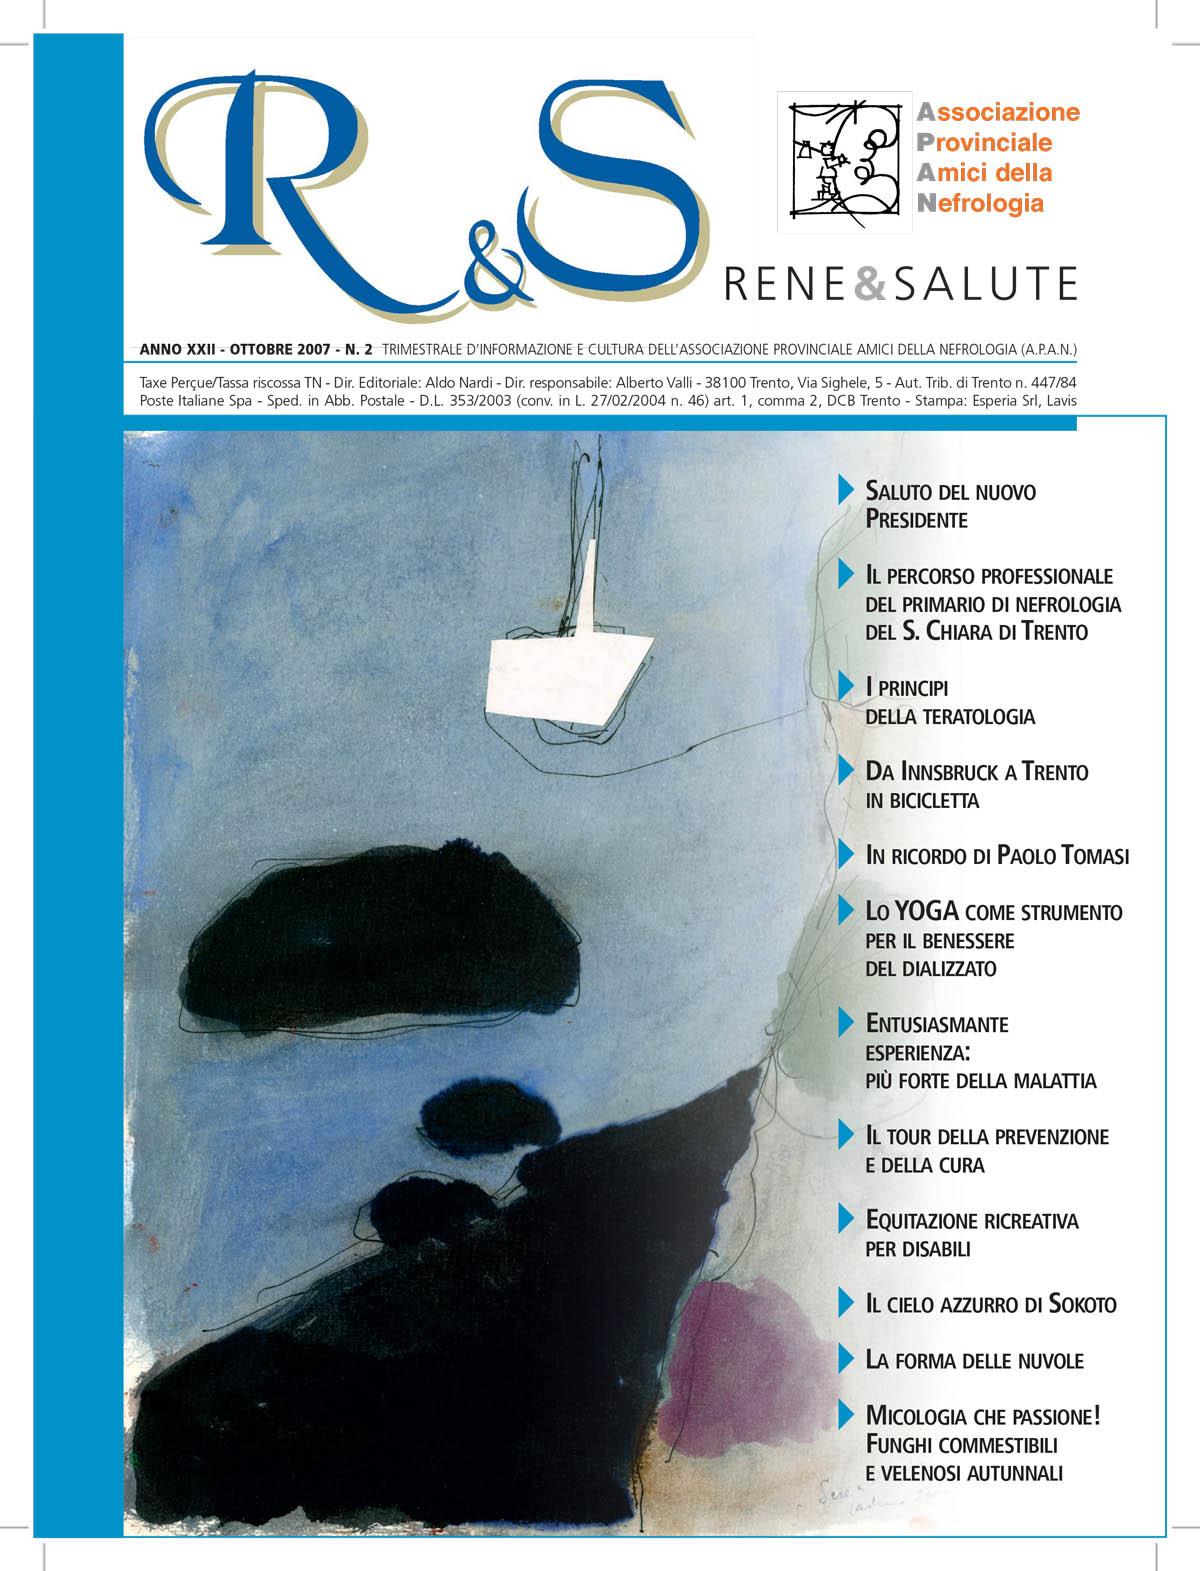 Rene & Salute 2007/2